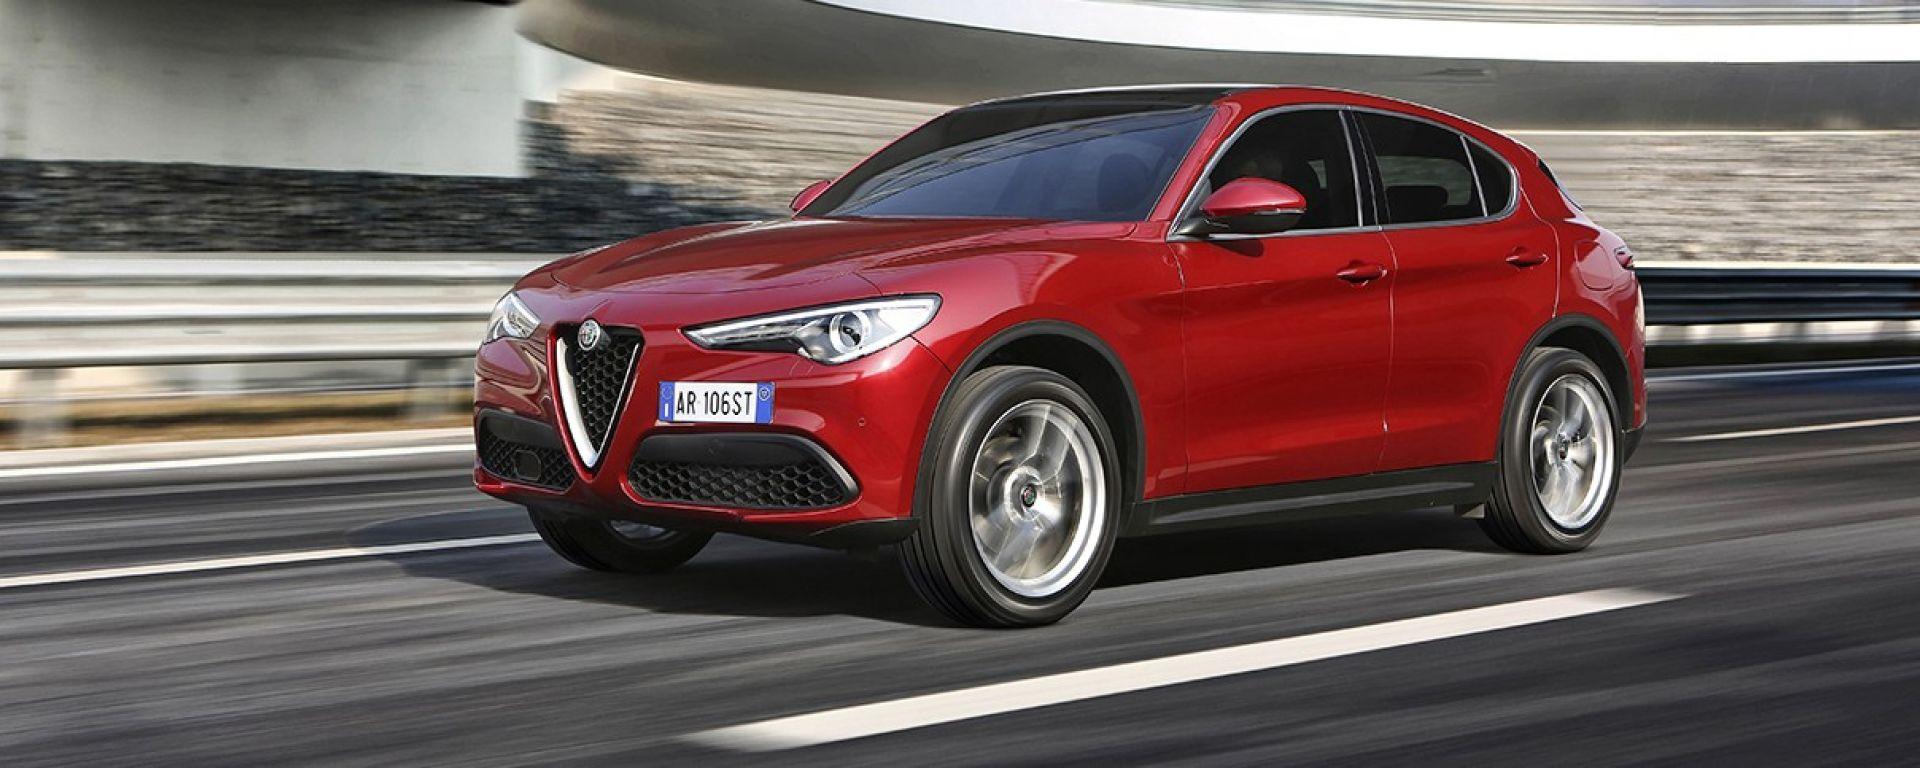 Alfa Romeo Stelvio: si noleggia con Hertz